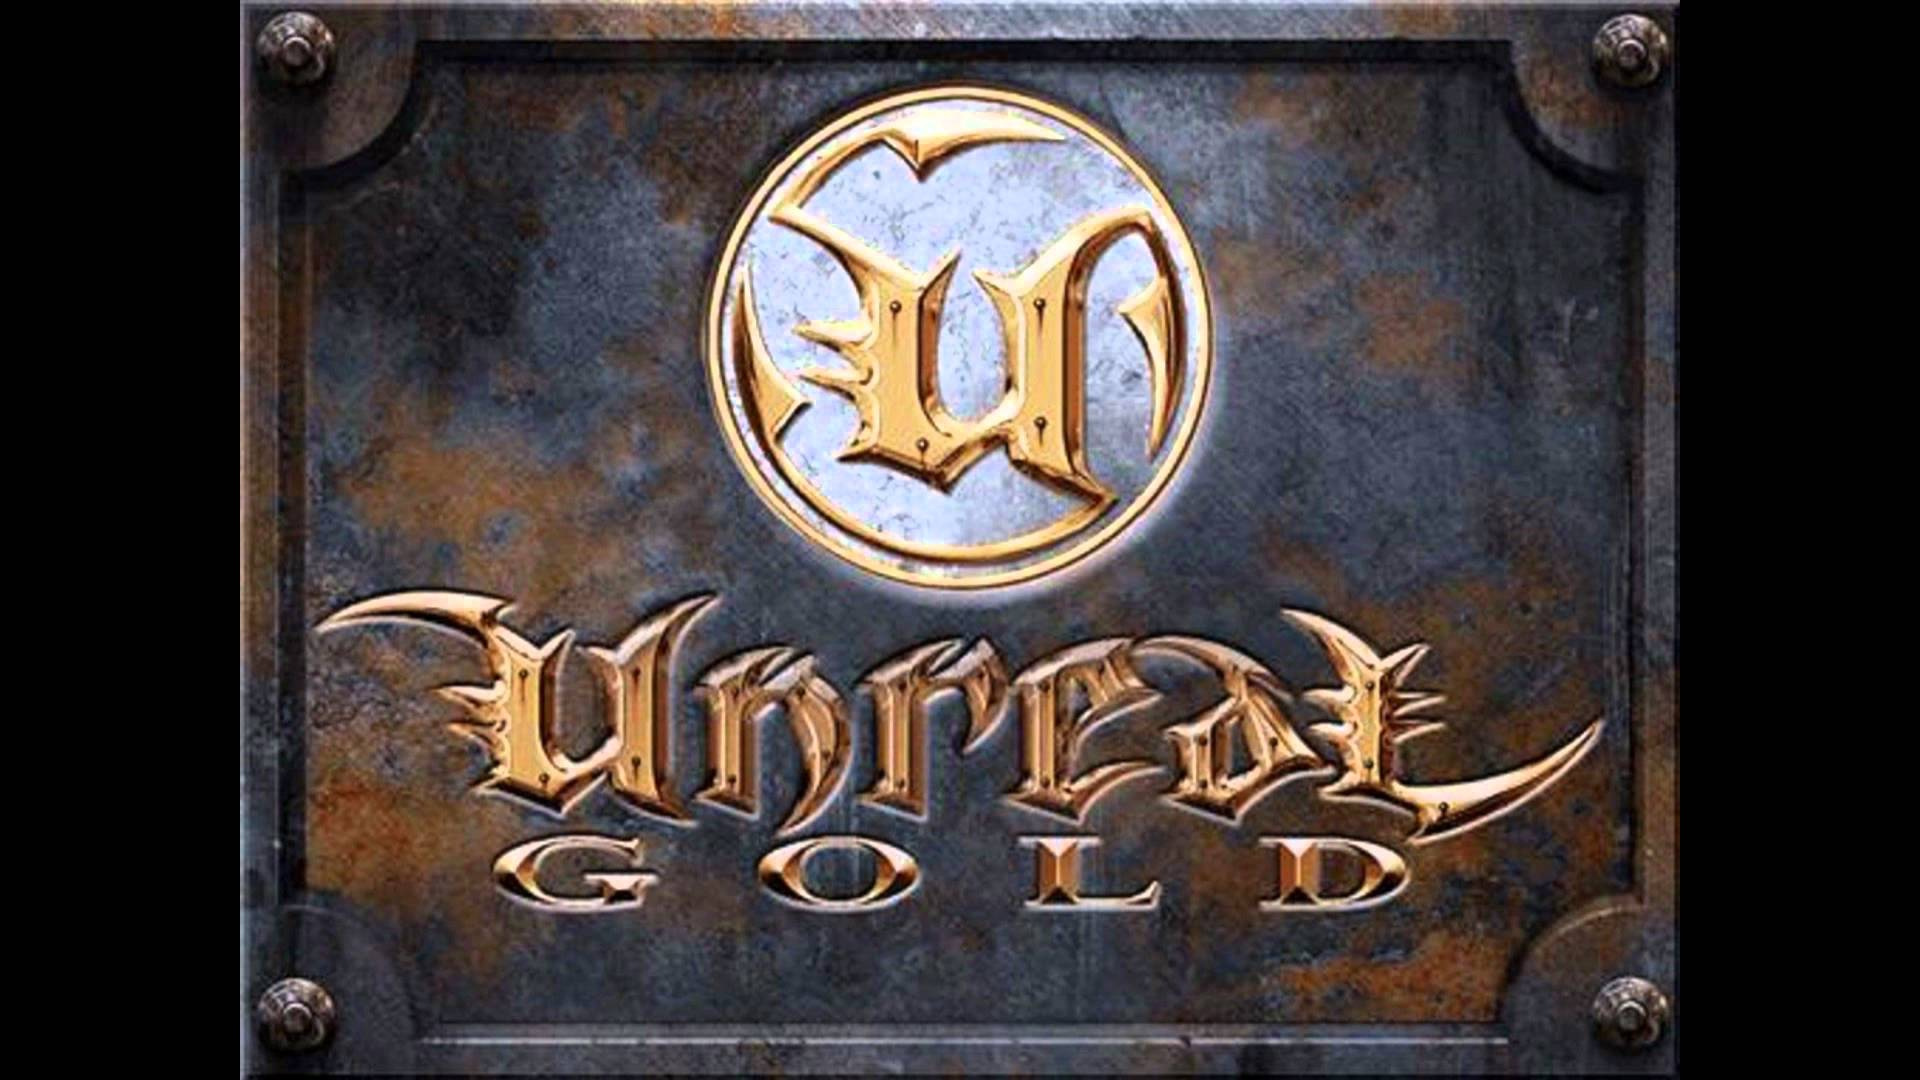 Unreal Gold наPCбесплатно инавсегда